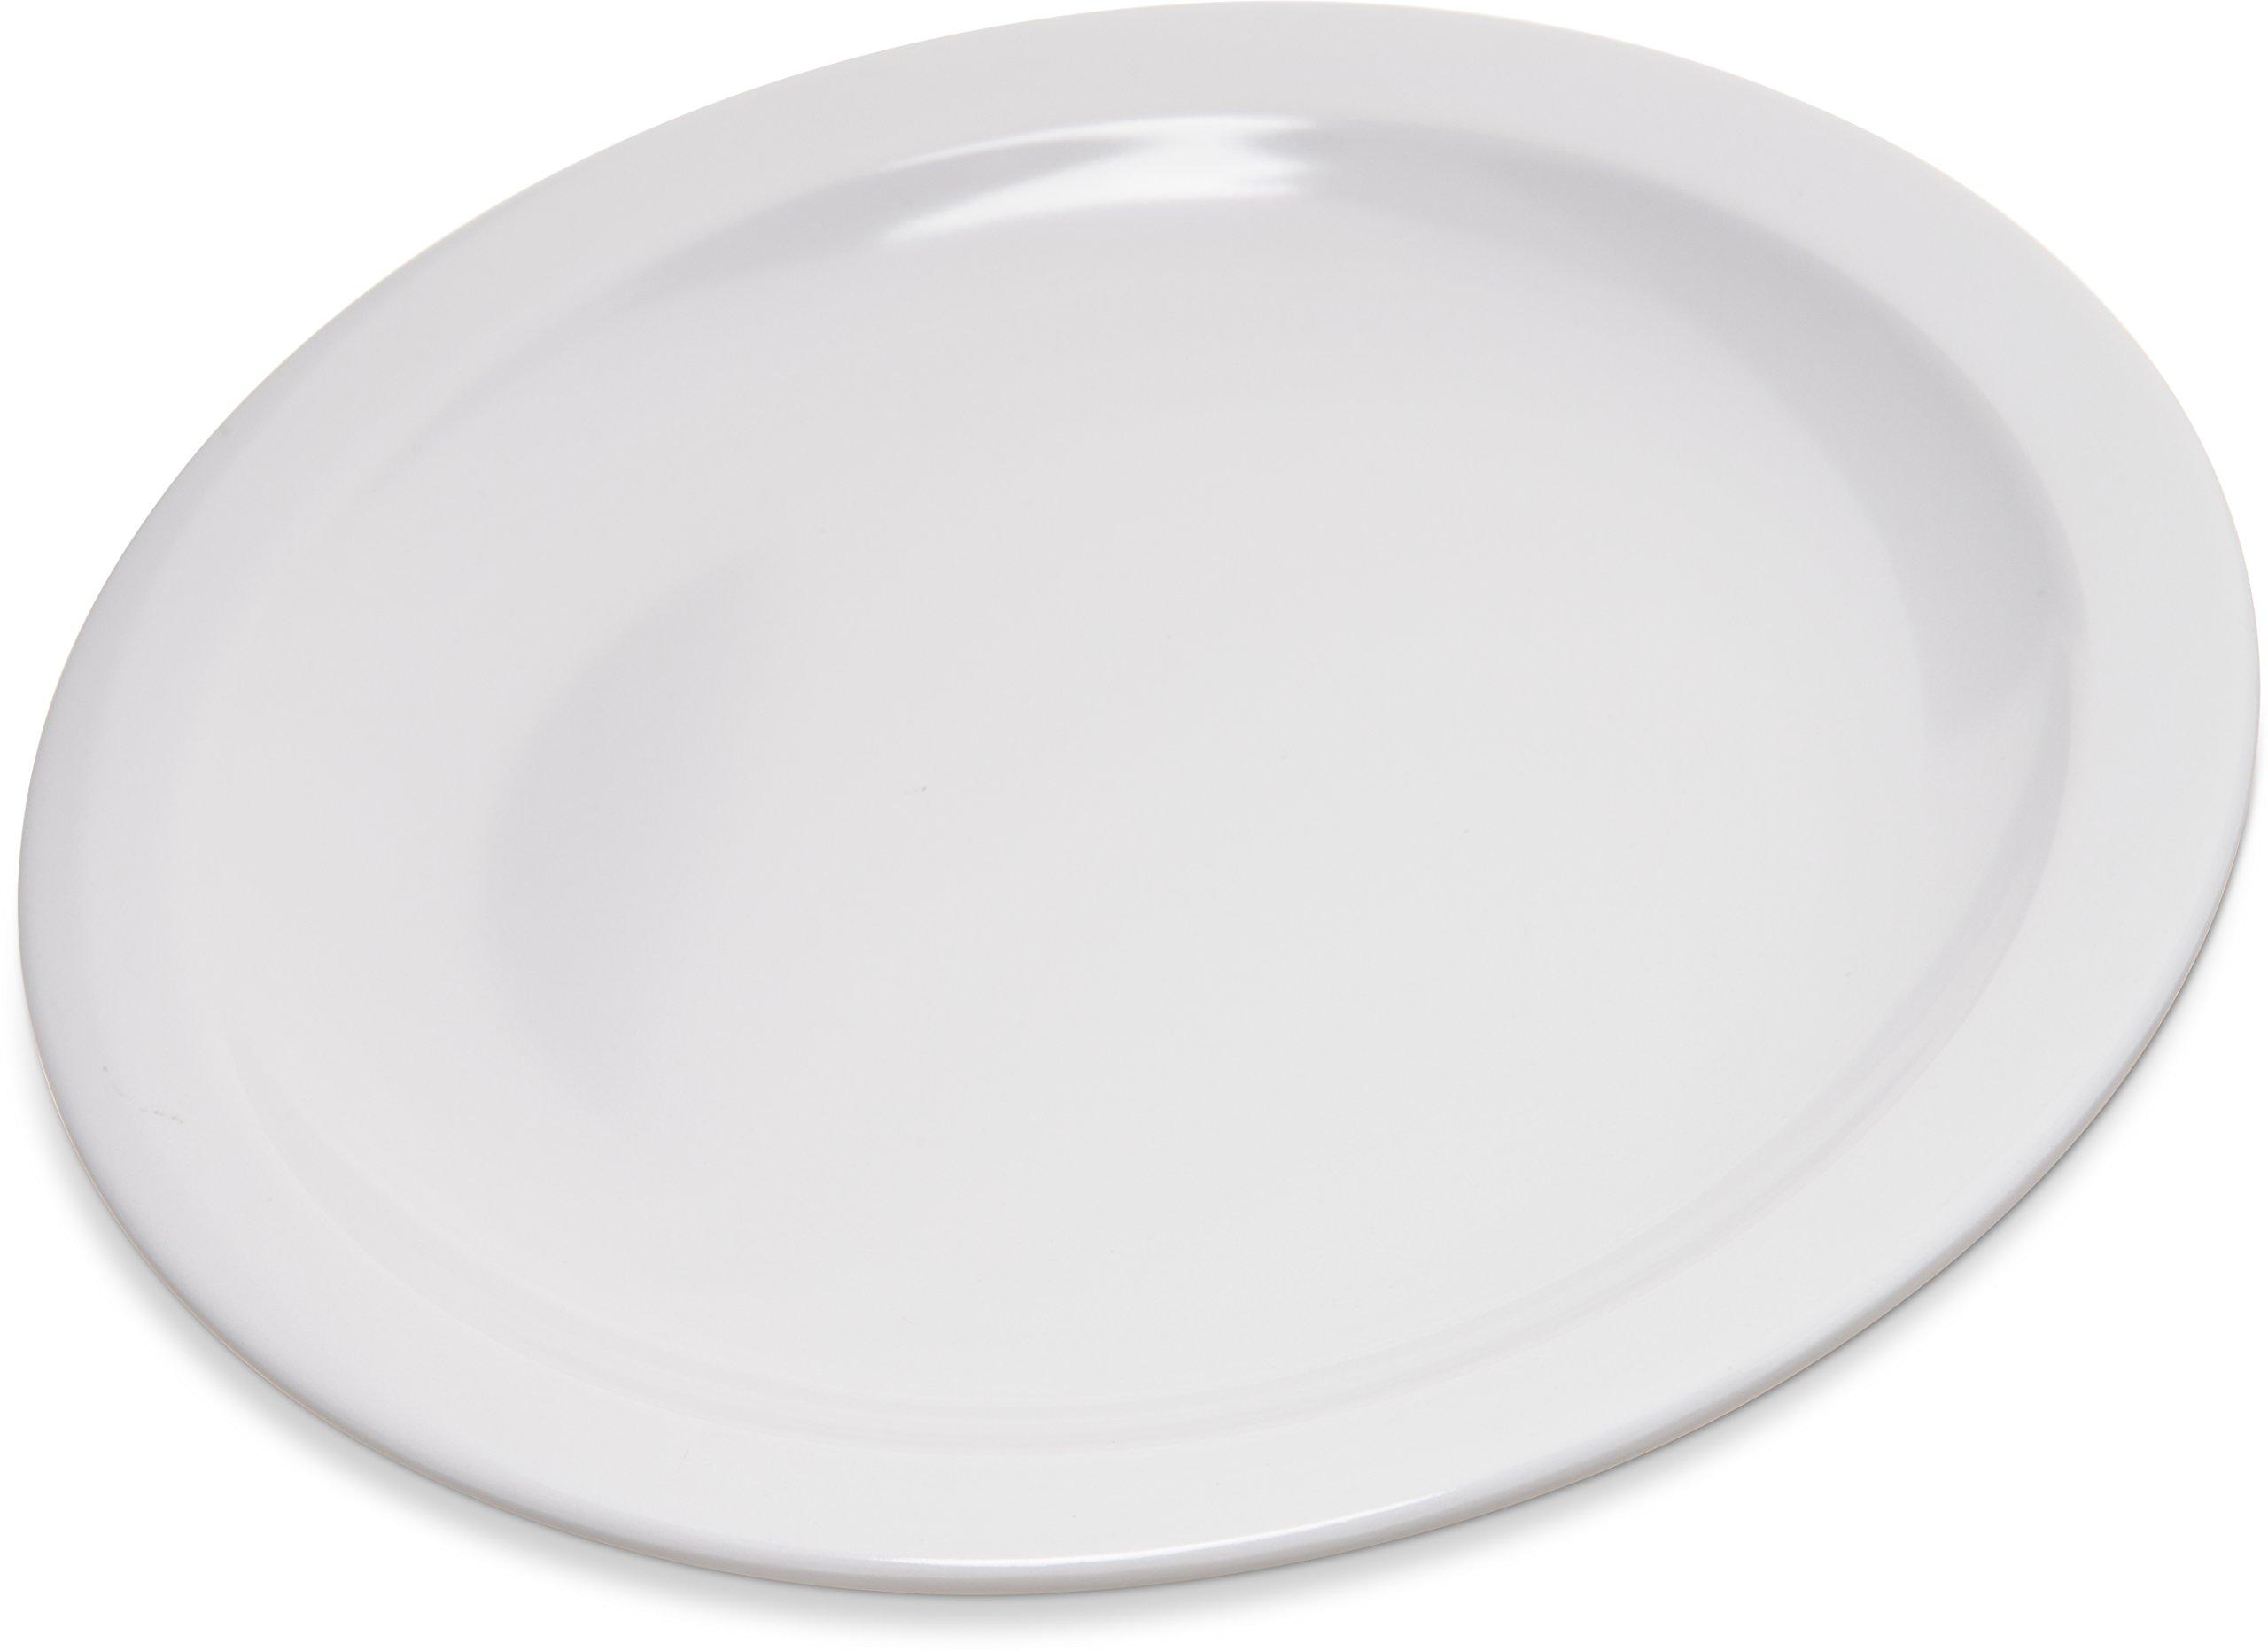 Carlisle 4350402 Dallas Ware Melamine Pie Plate, 6.5'' Diameter x 0.70'' Height, White (Case of 48)